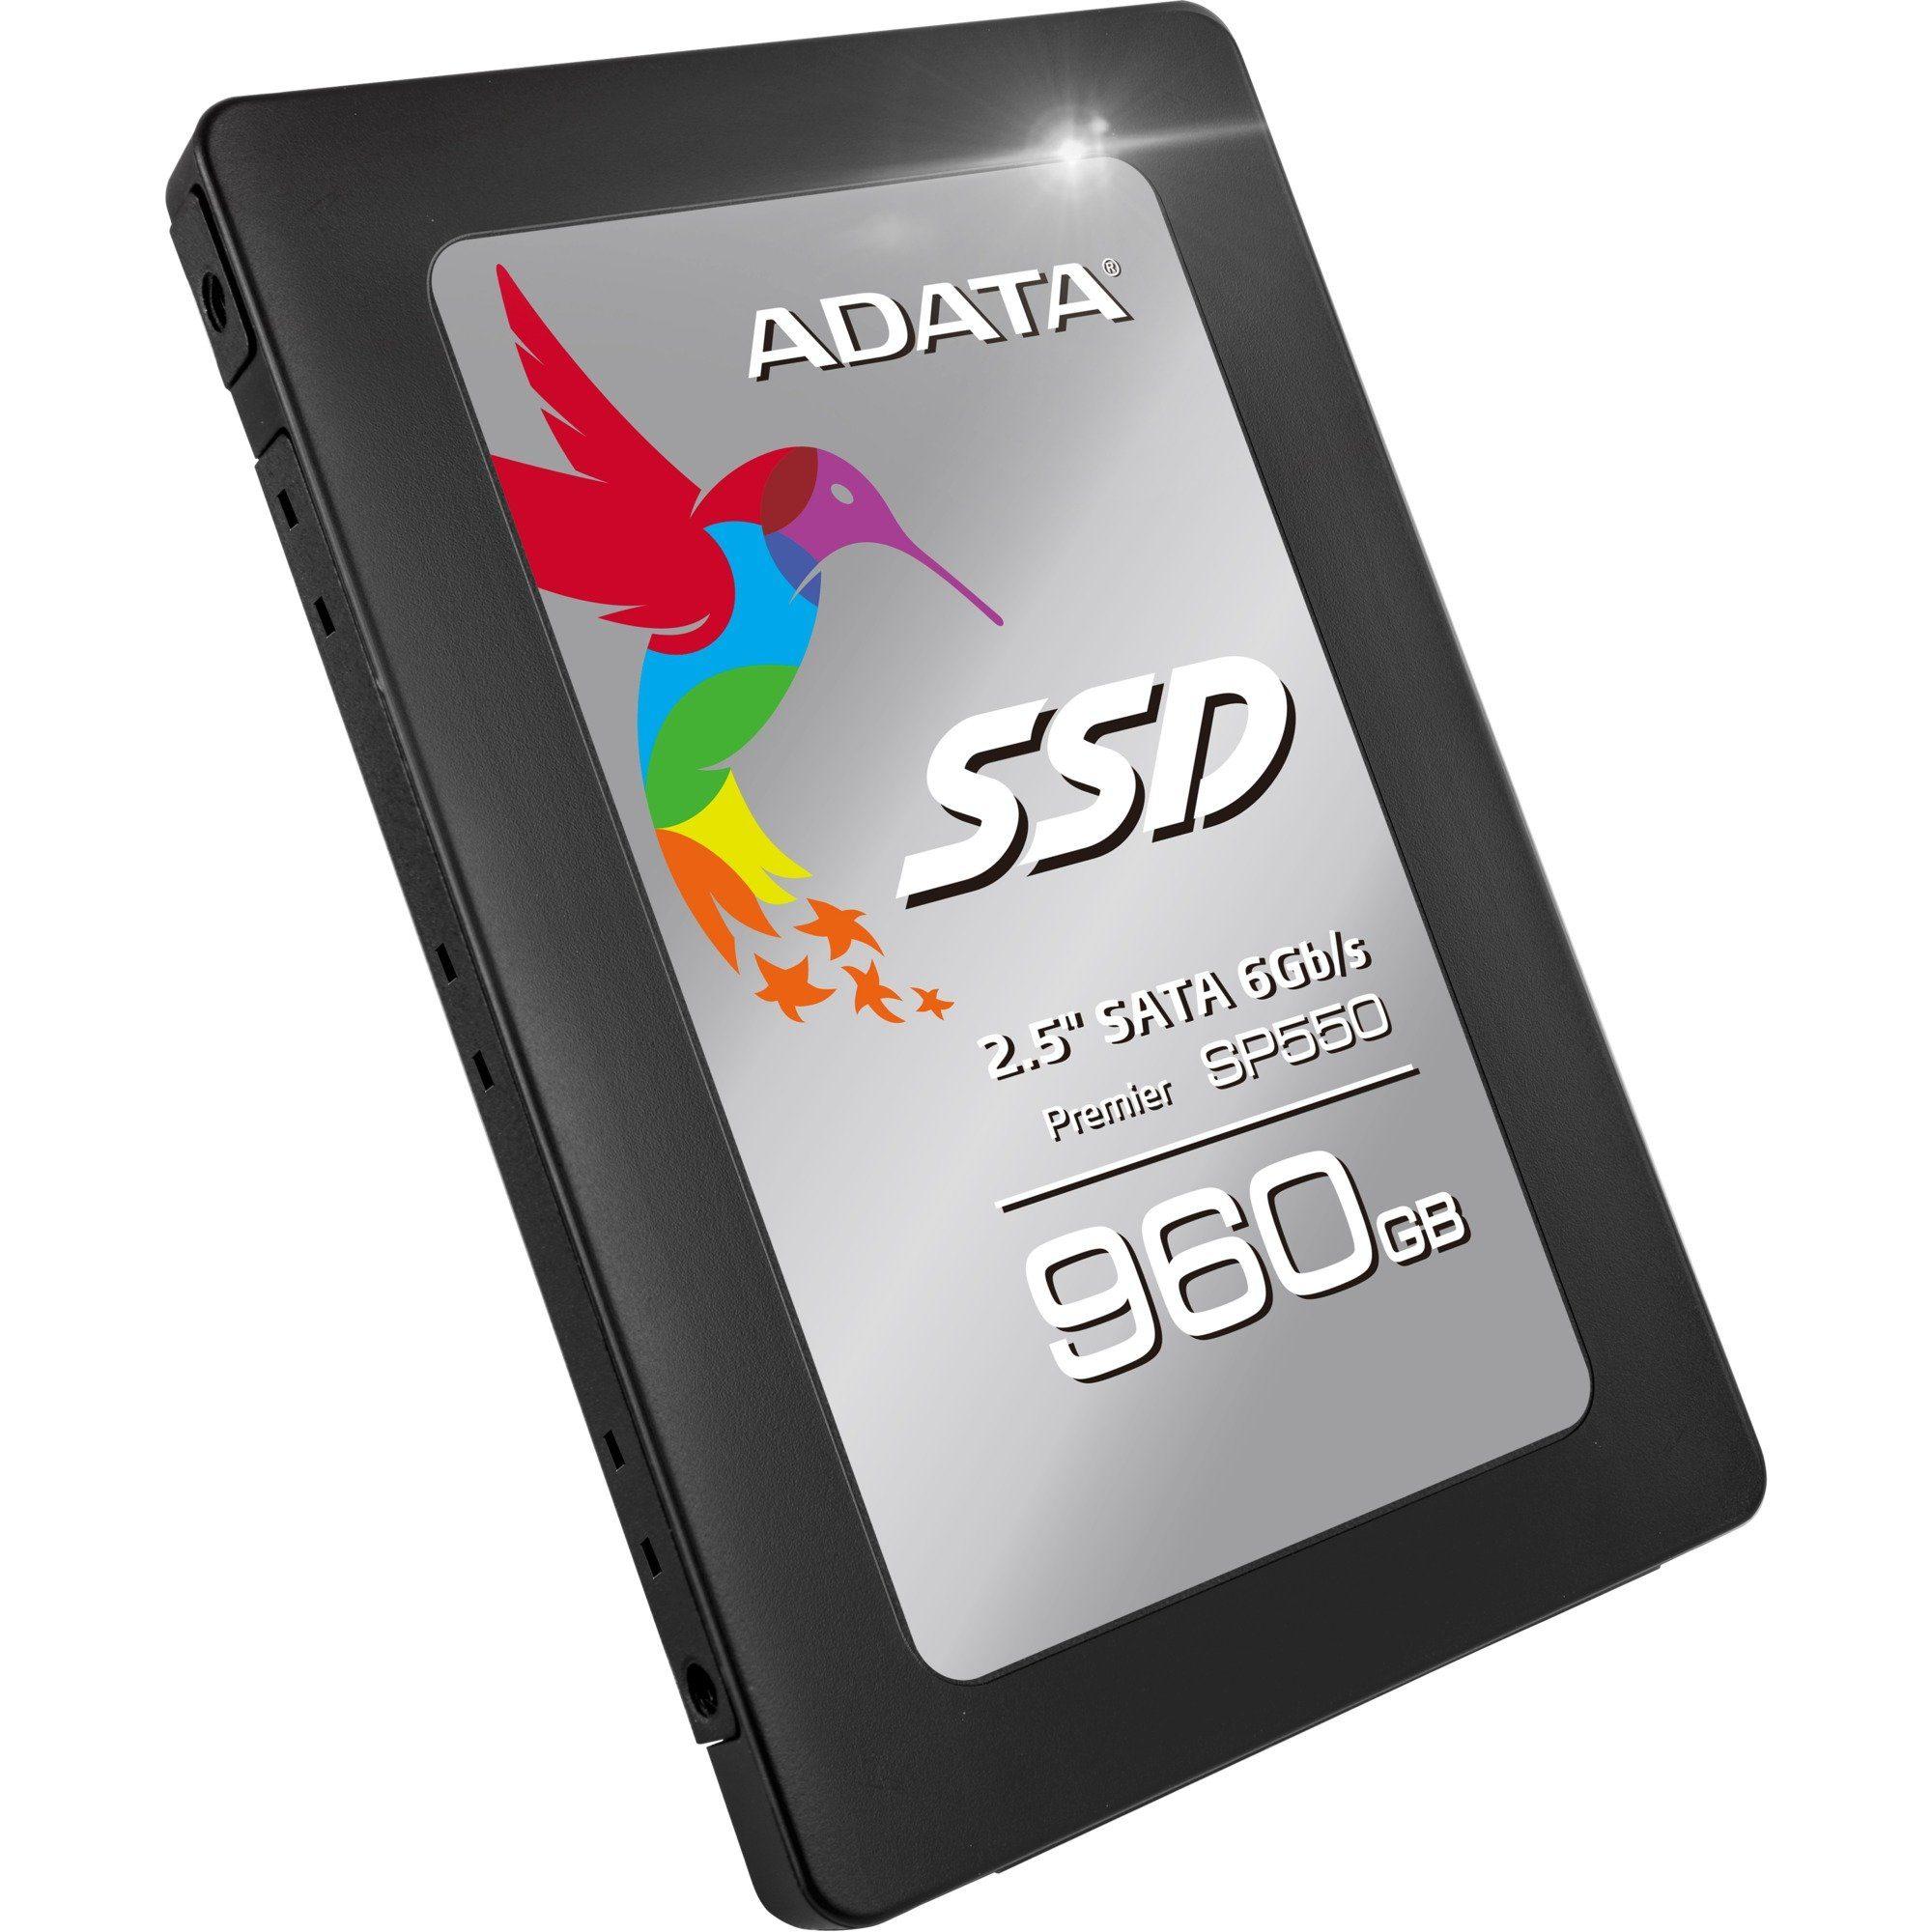 ADATA Solid State Drive »ASP550SS3-960GM-C 960 GB«